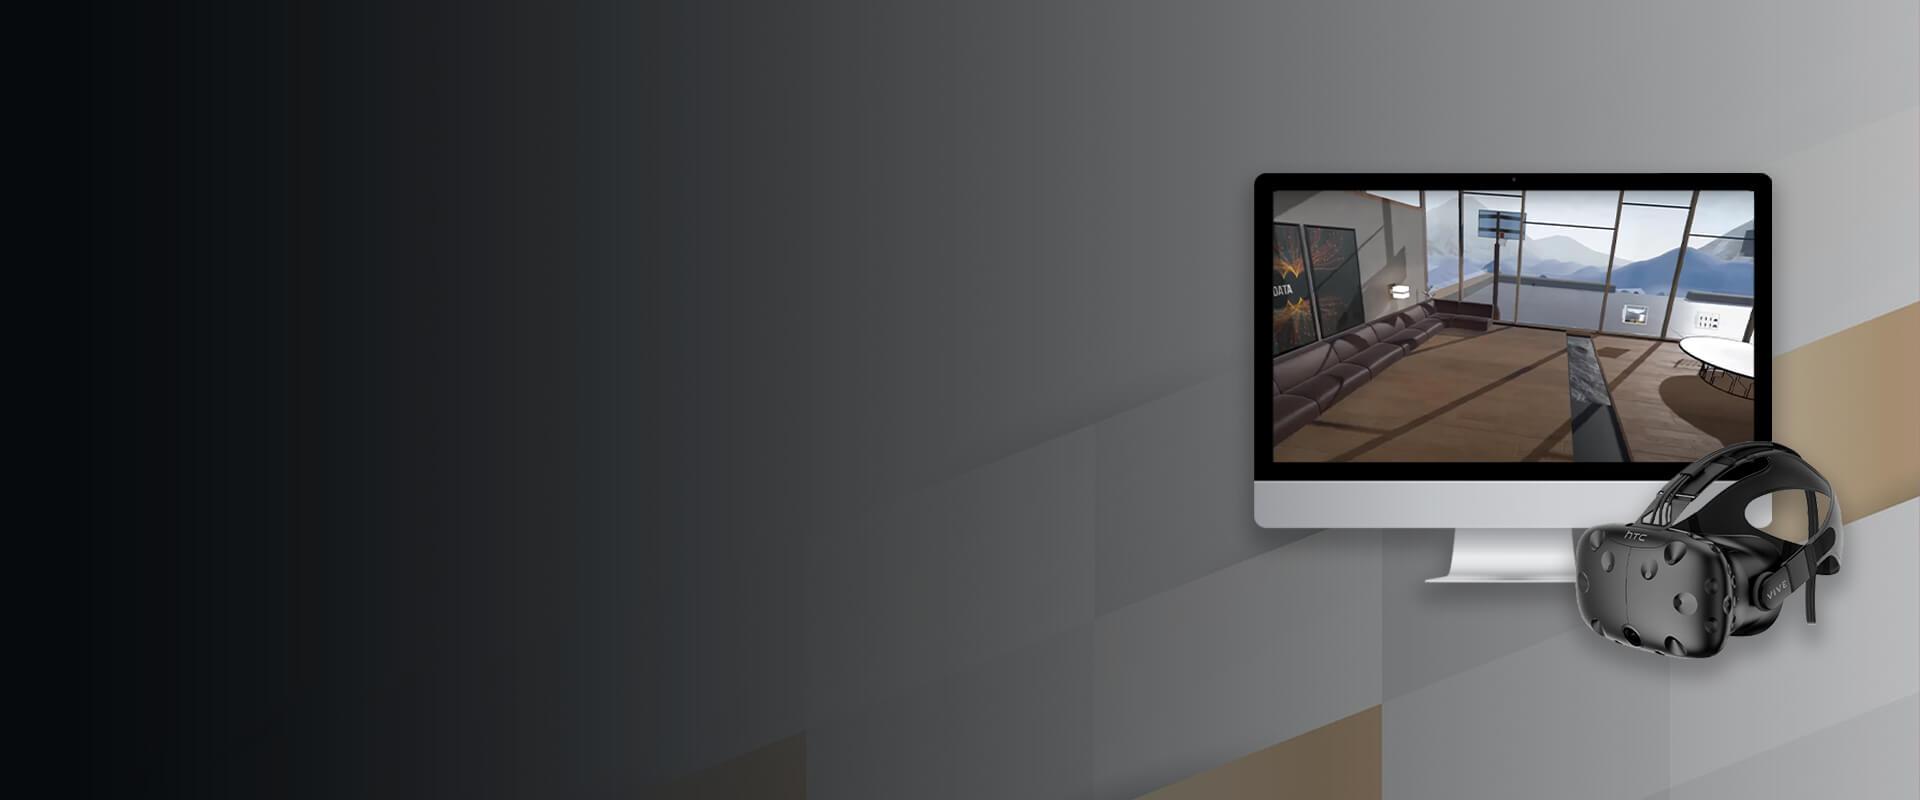 VRChat Collaborative Platform - Visartech Portfolio